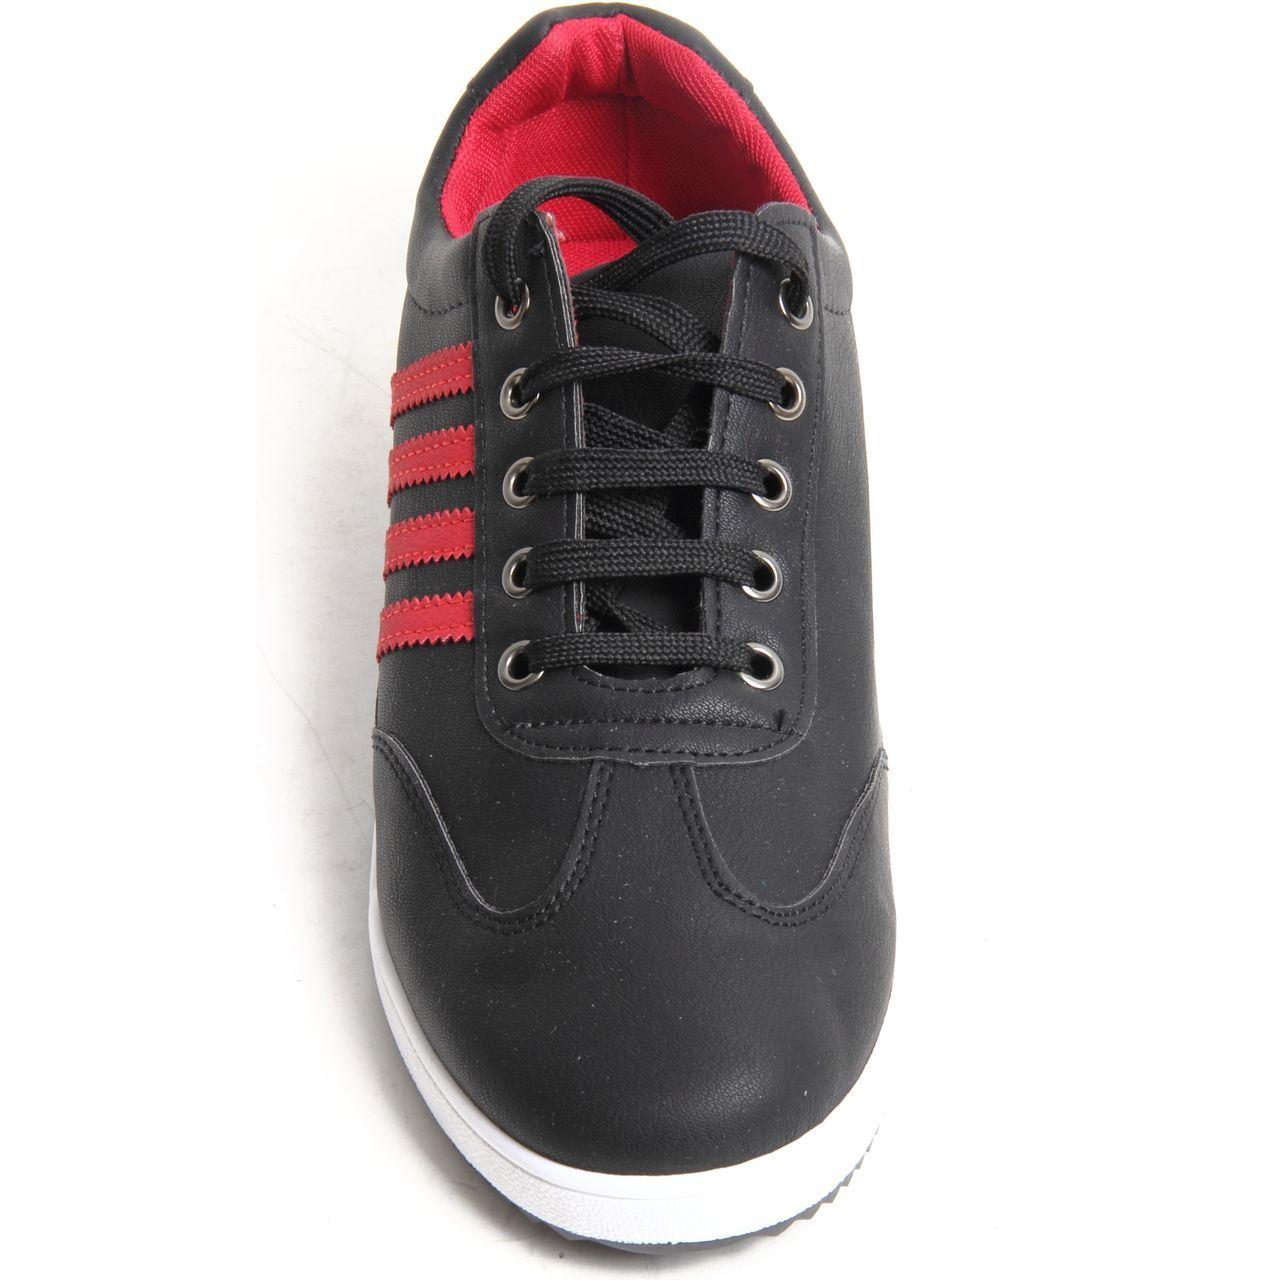 Mens Flat Soled Tennis Shoes